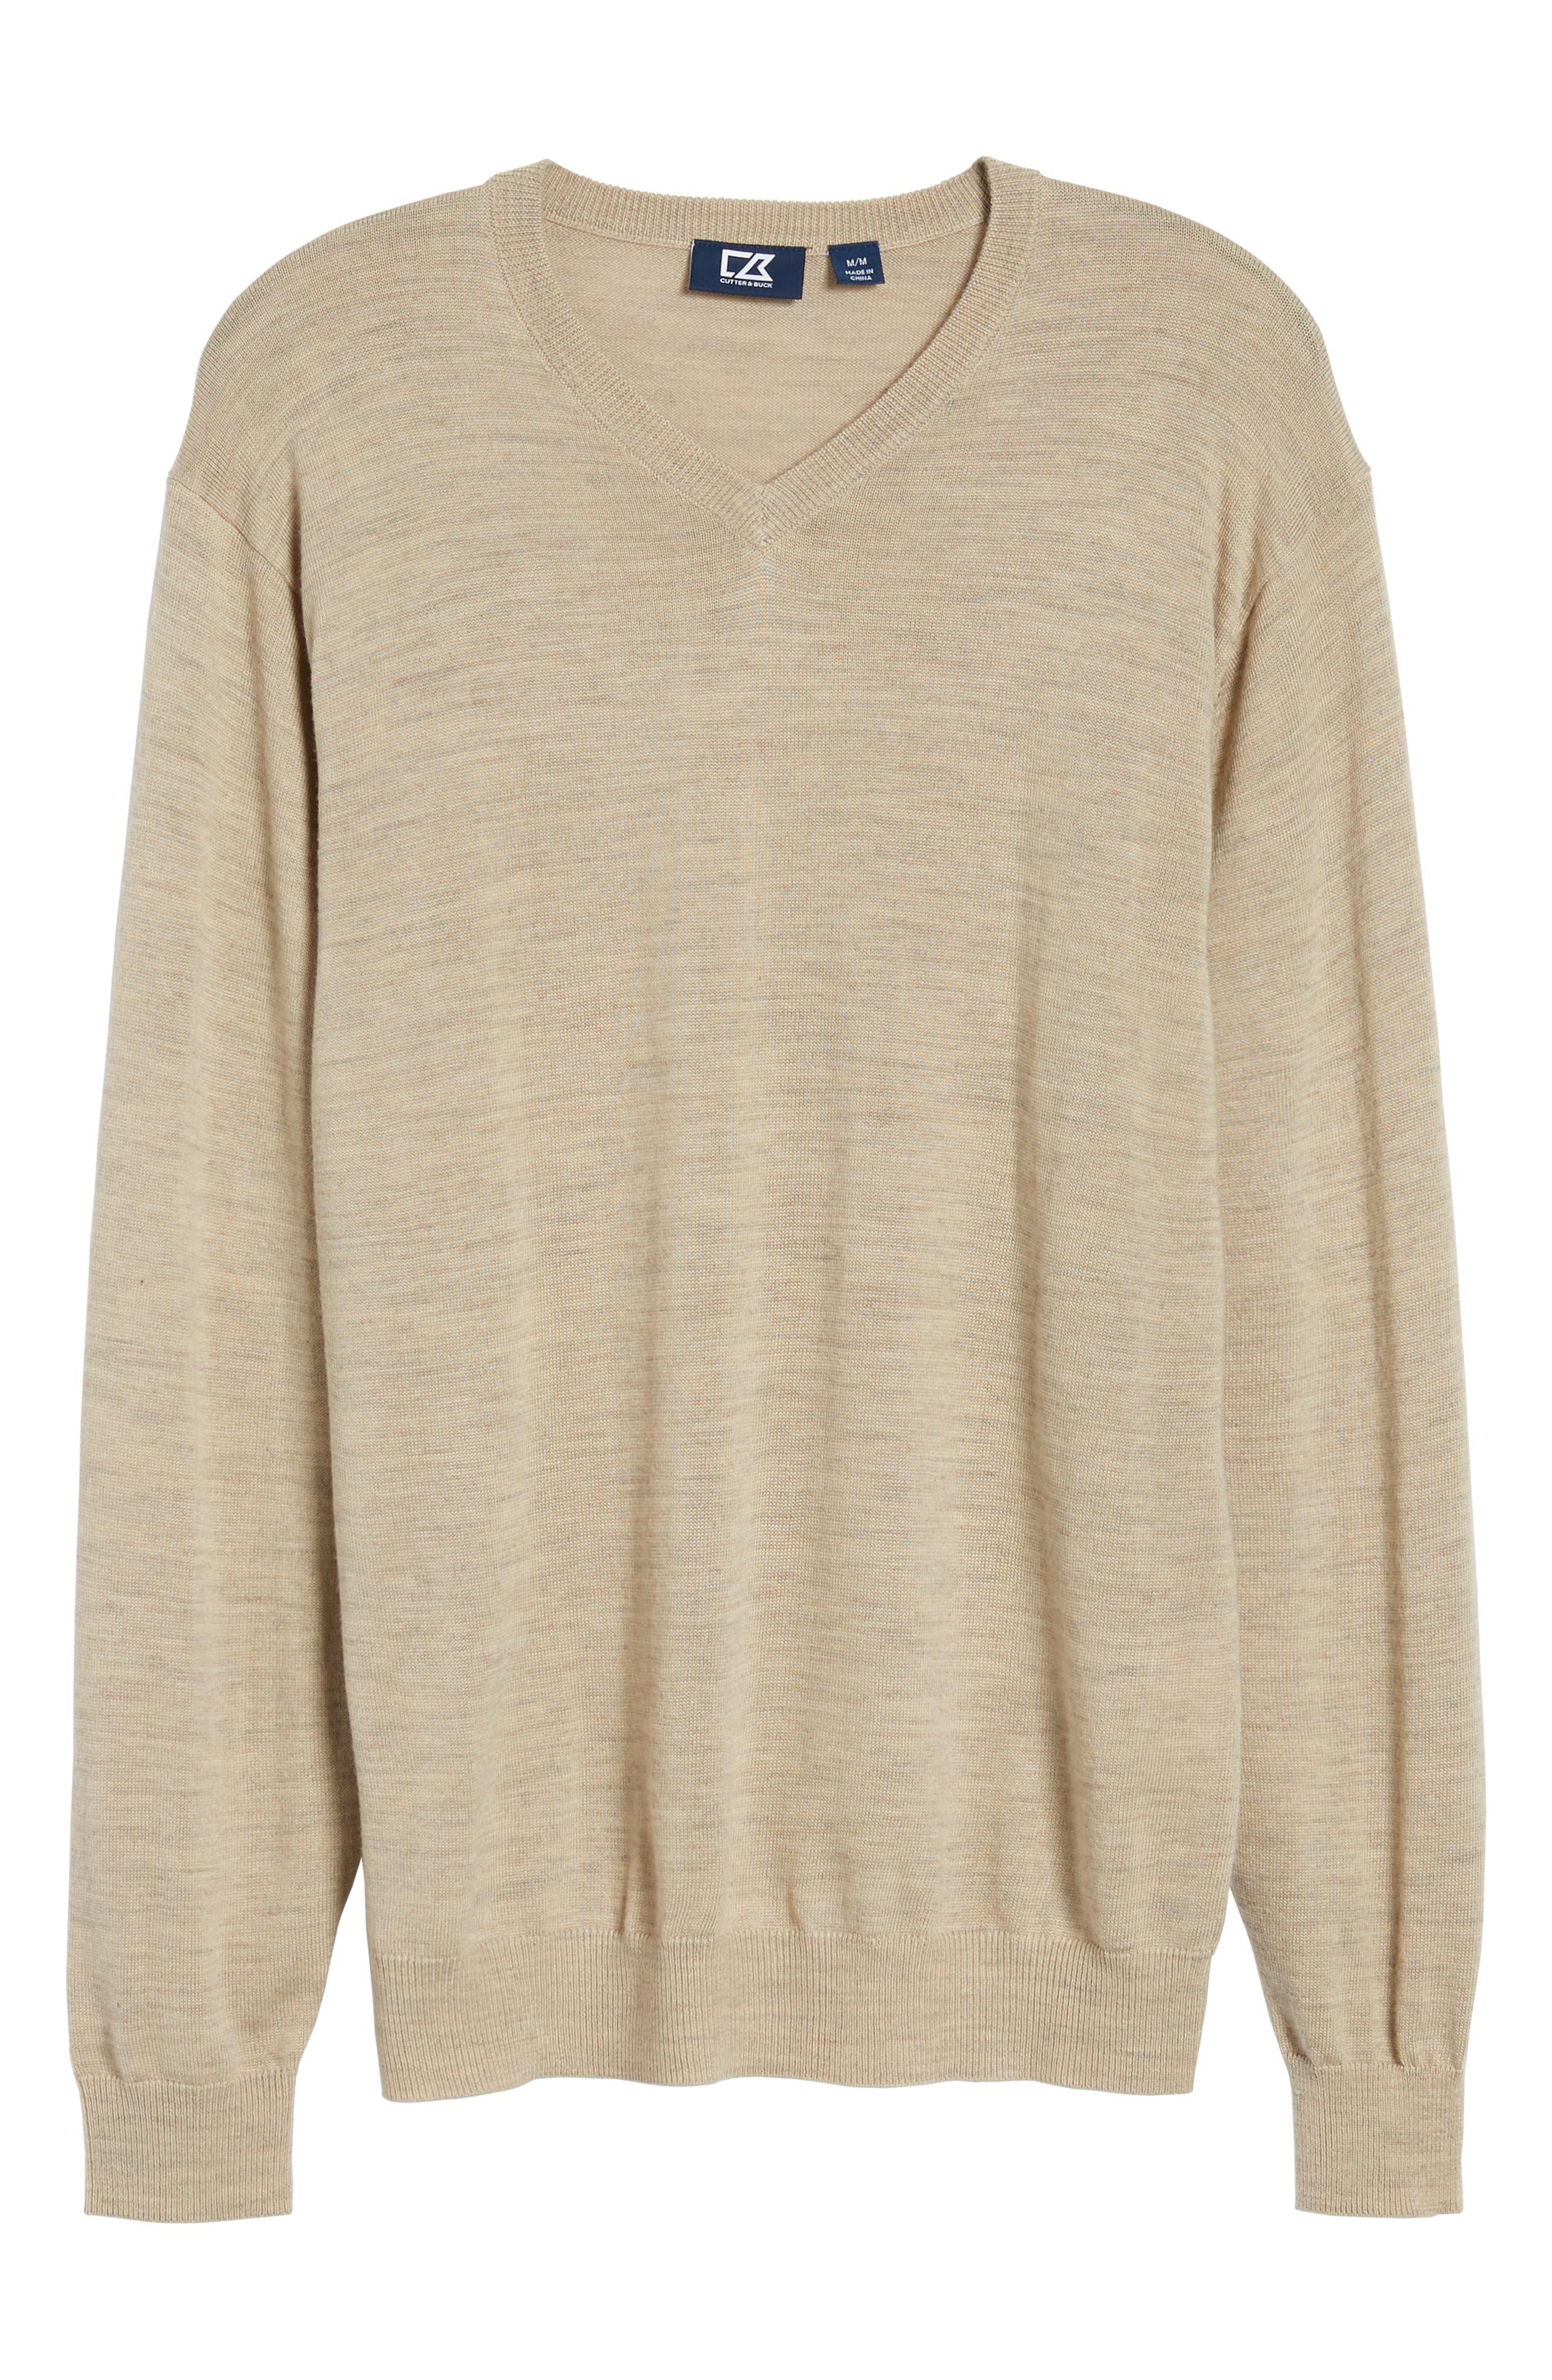 CUTTER & BUCK, 'Douglas' Merino Wool Blend V-Neck Sweater, Alternate thumbnail 6, color, SAND HEATHER